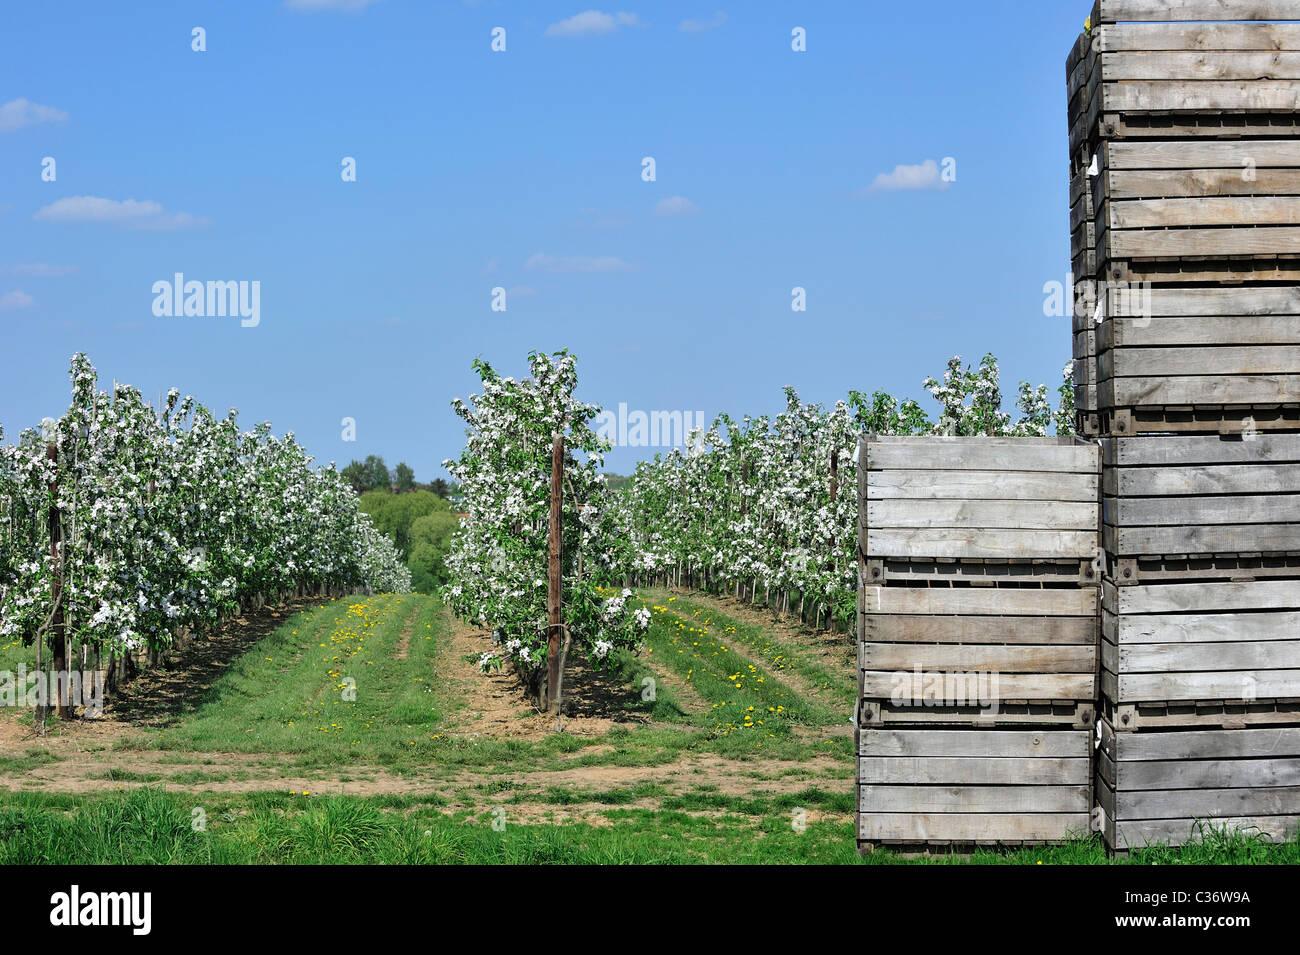 Planter Dans Une Caisse En Bois wooden crates stacked in half-standard apple tree (malus